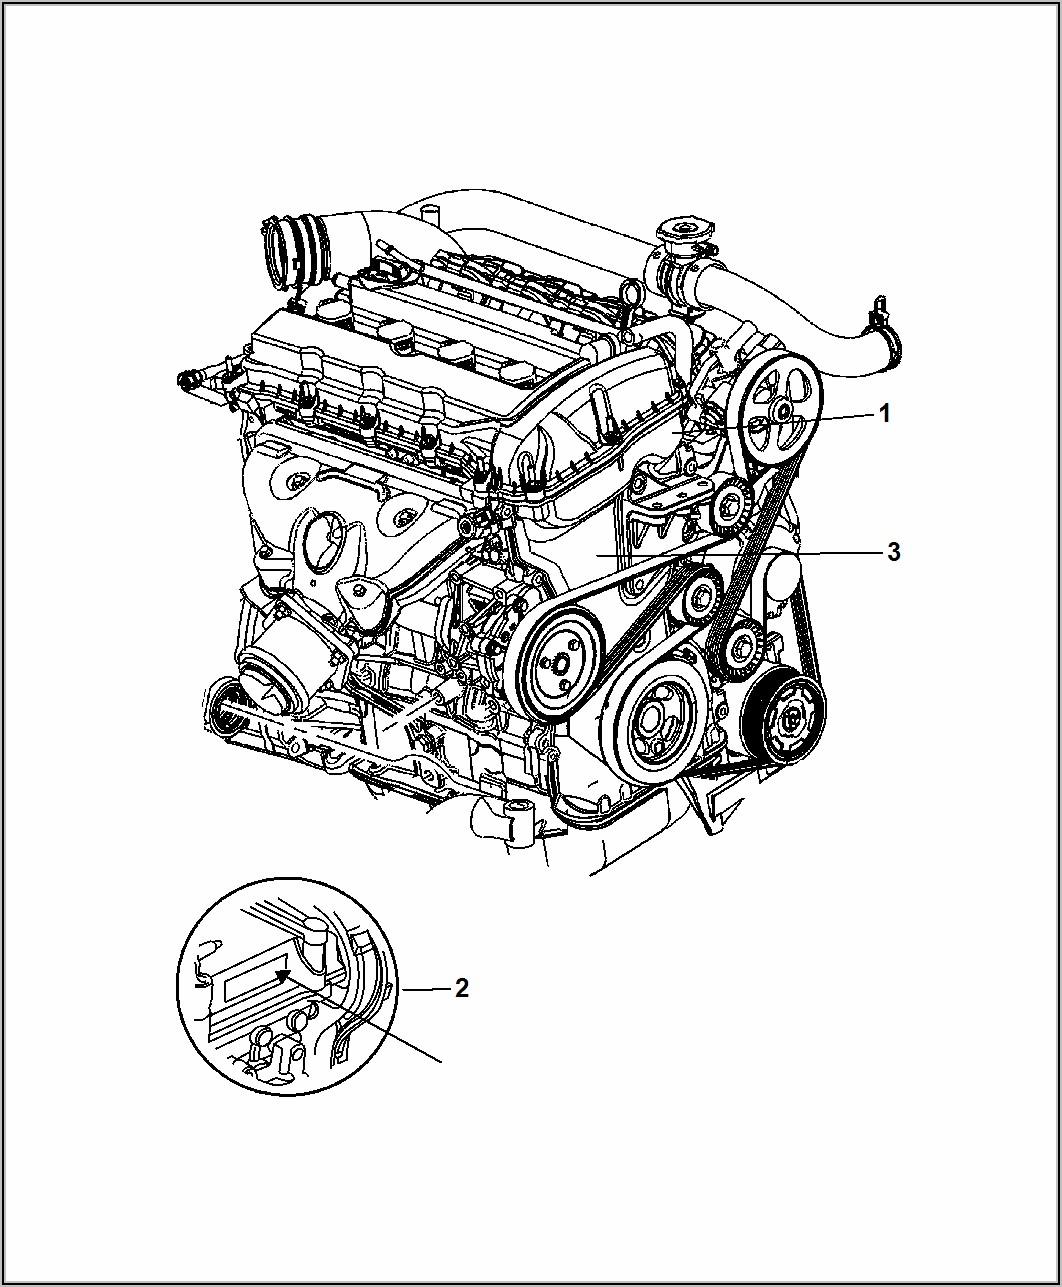 2013 Dodge Avenger 2.4 Serpentine Belt Diagram